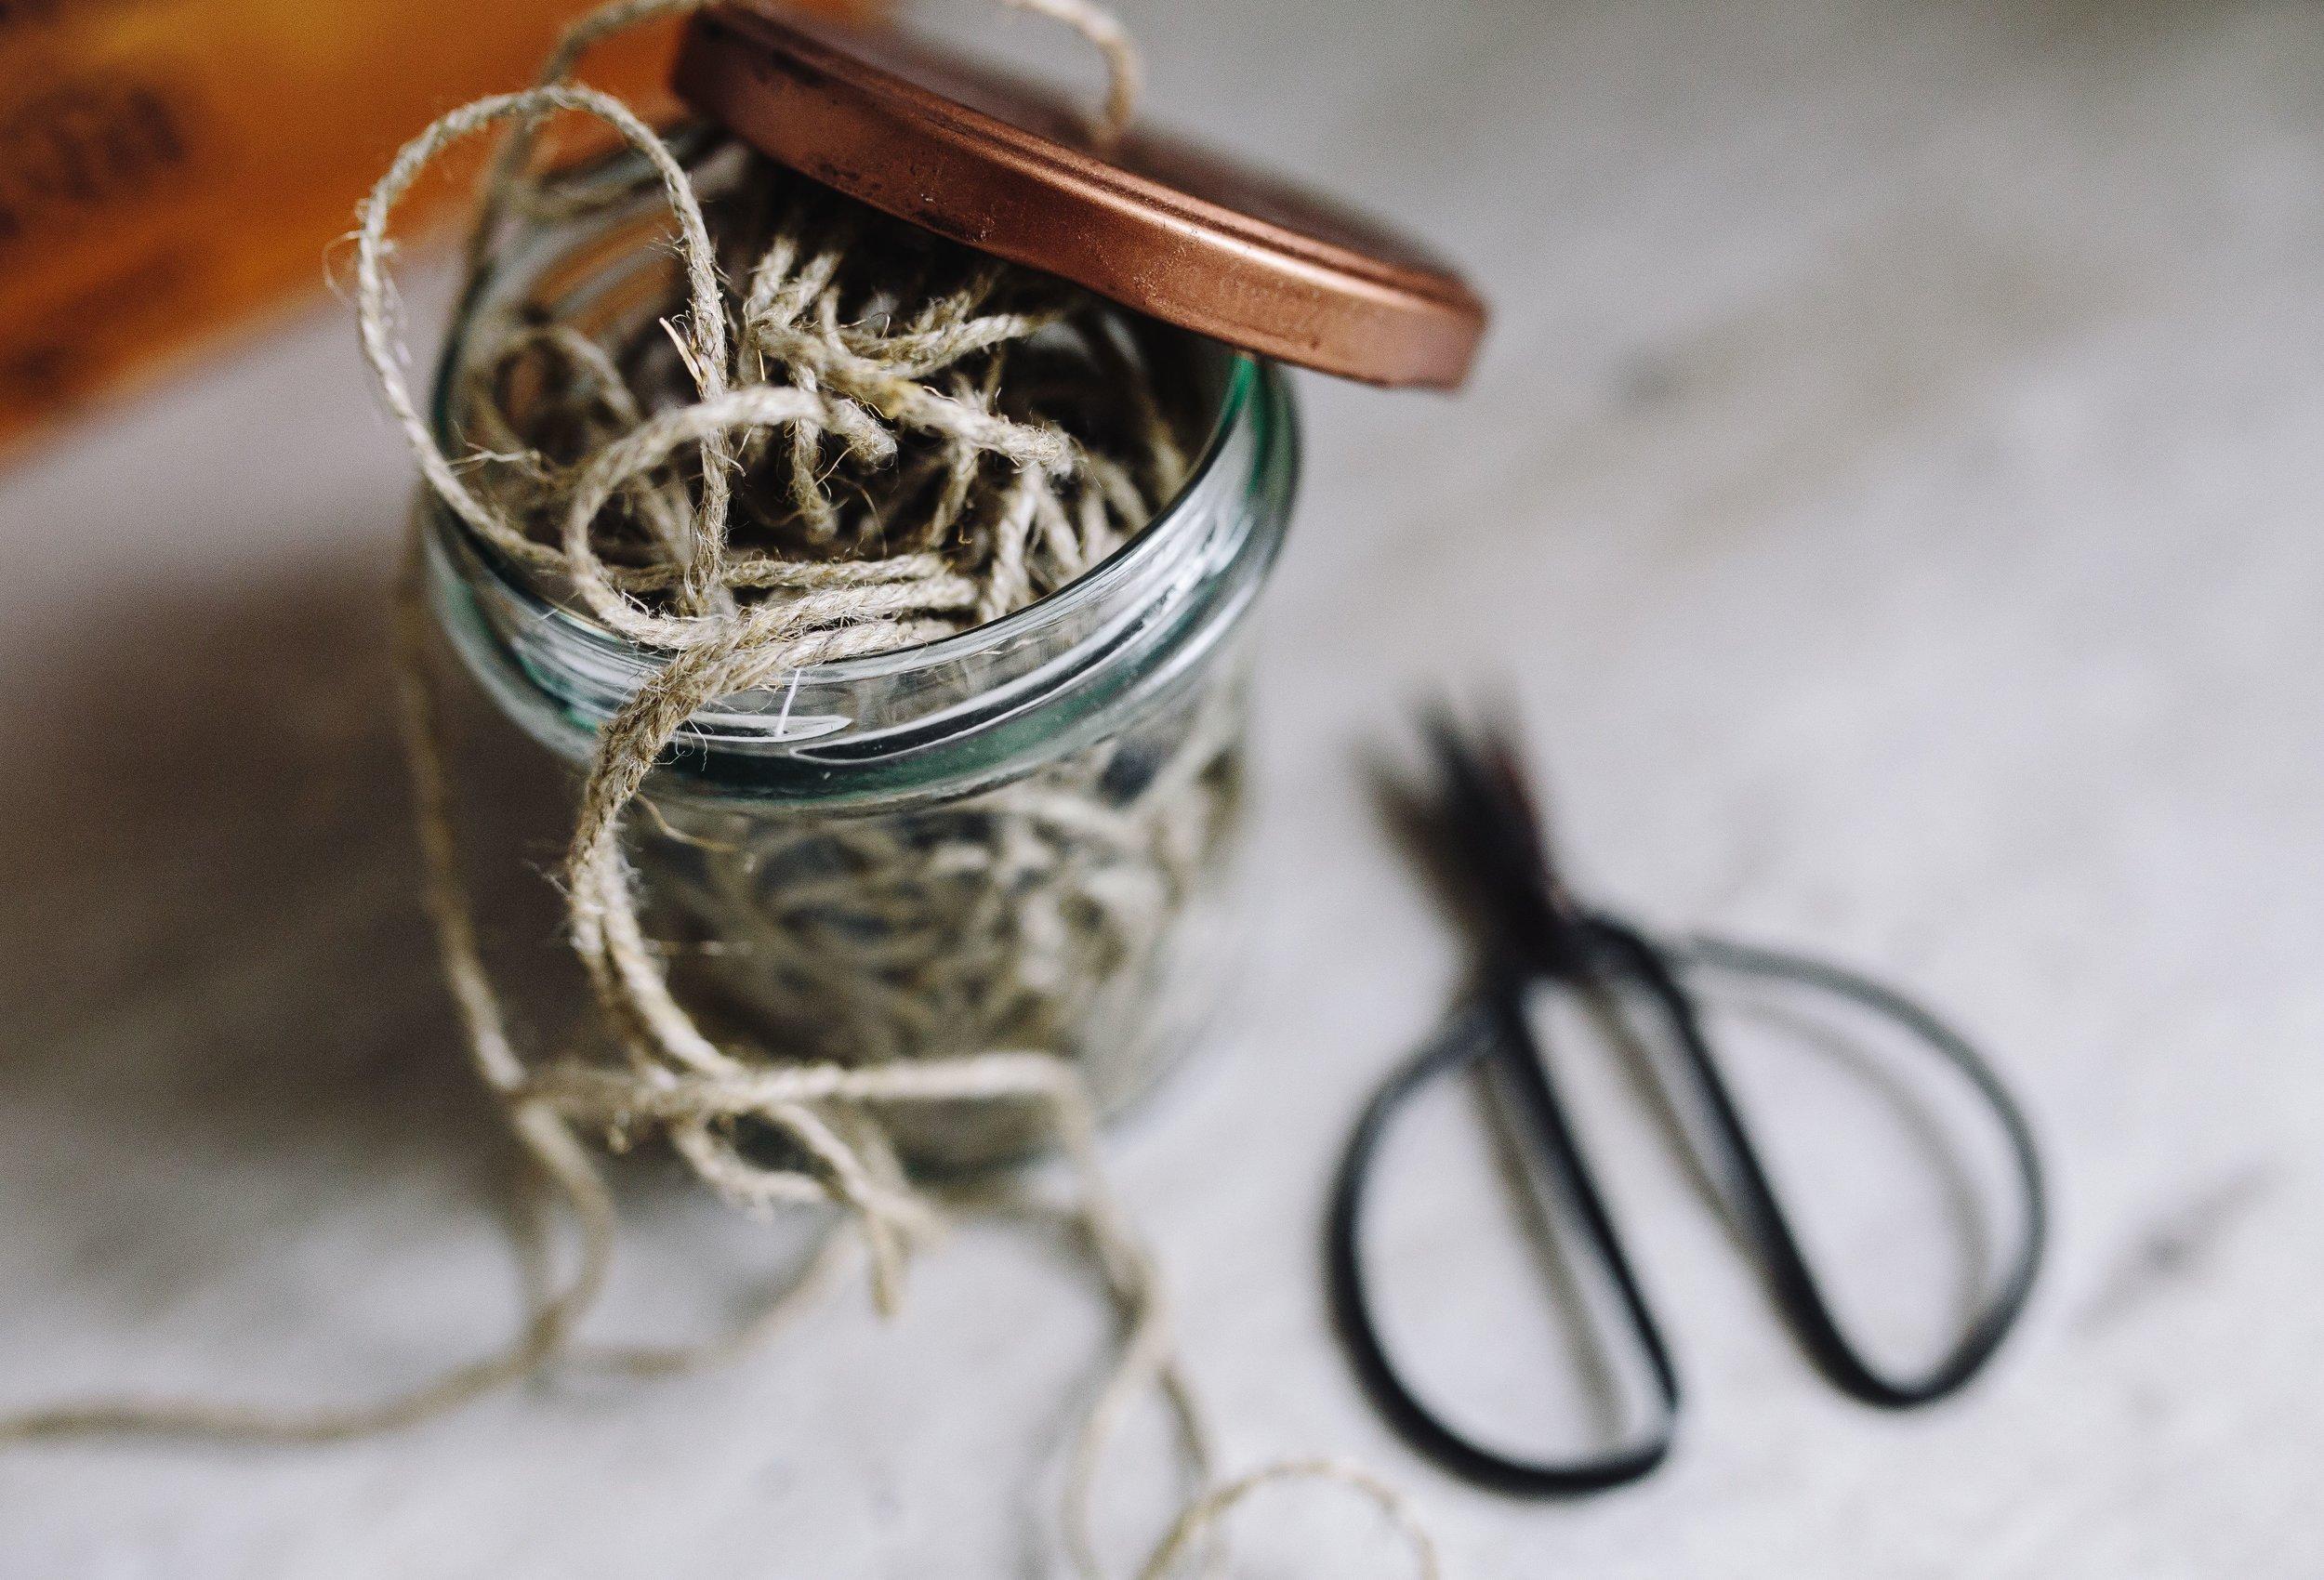 kaboompics_A jar of thread.jpg